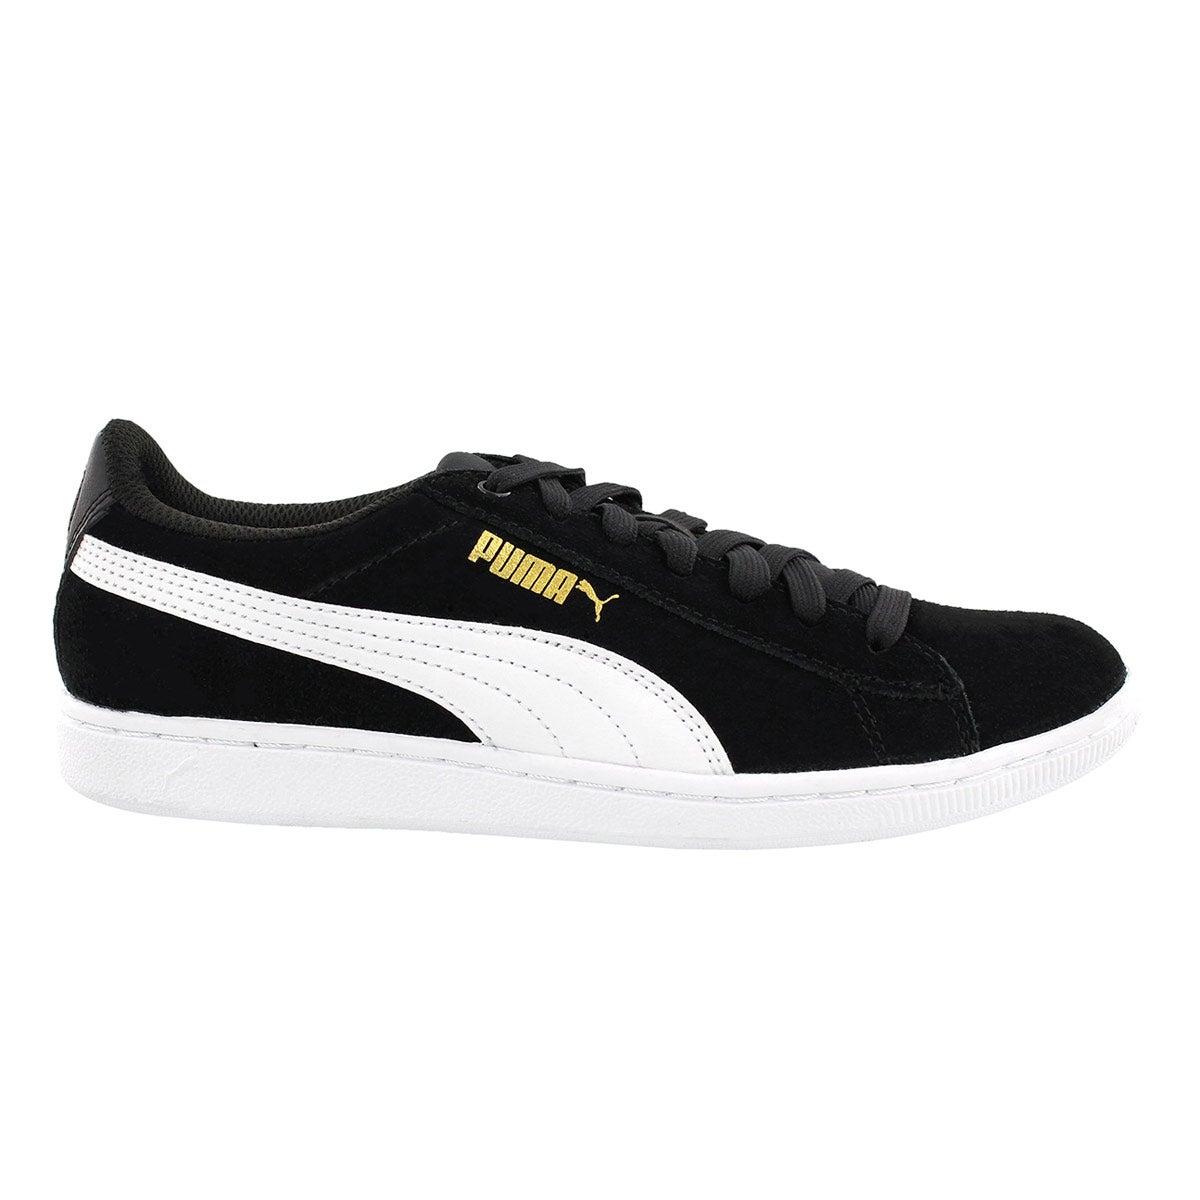 Lds Puma Vikky black/white sneaker